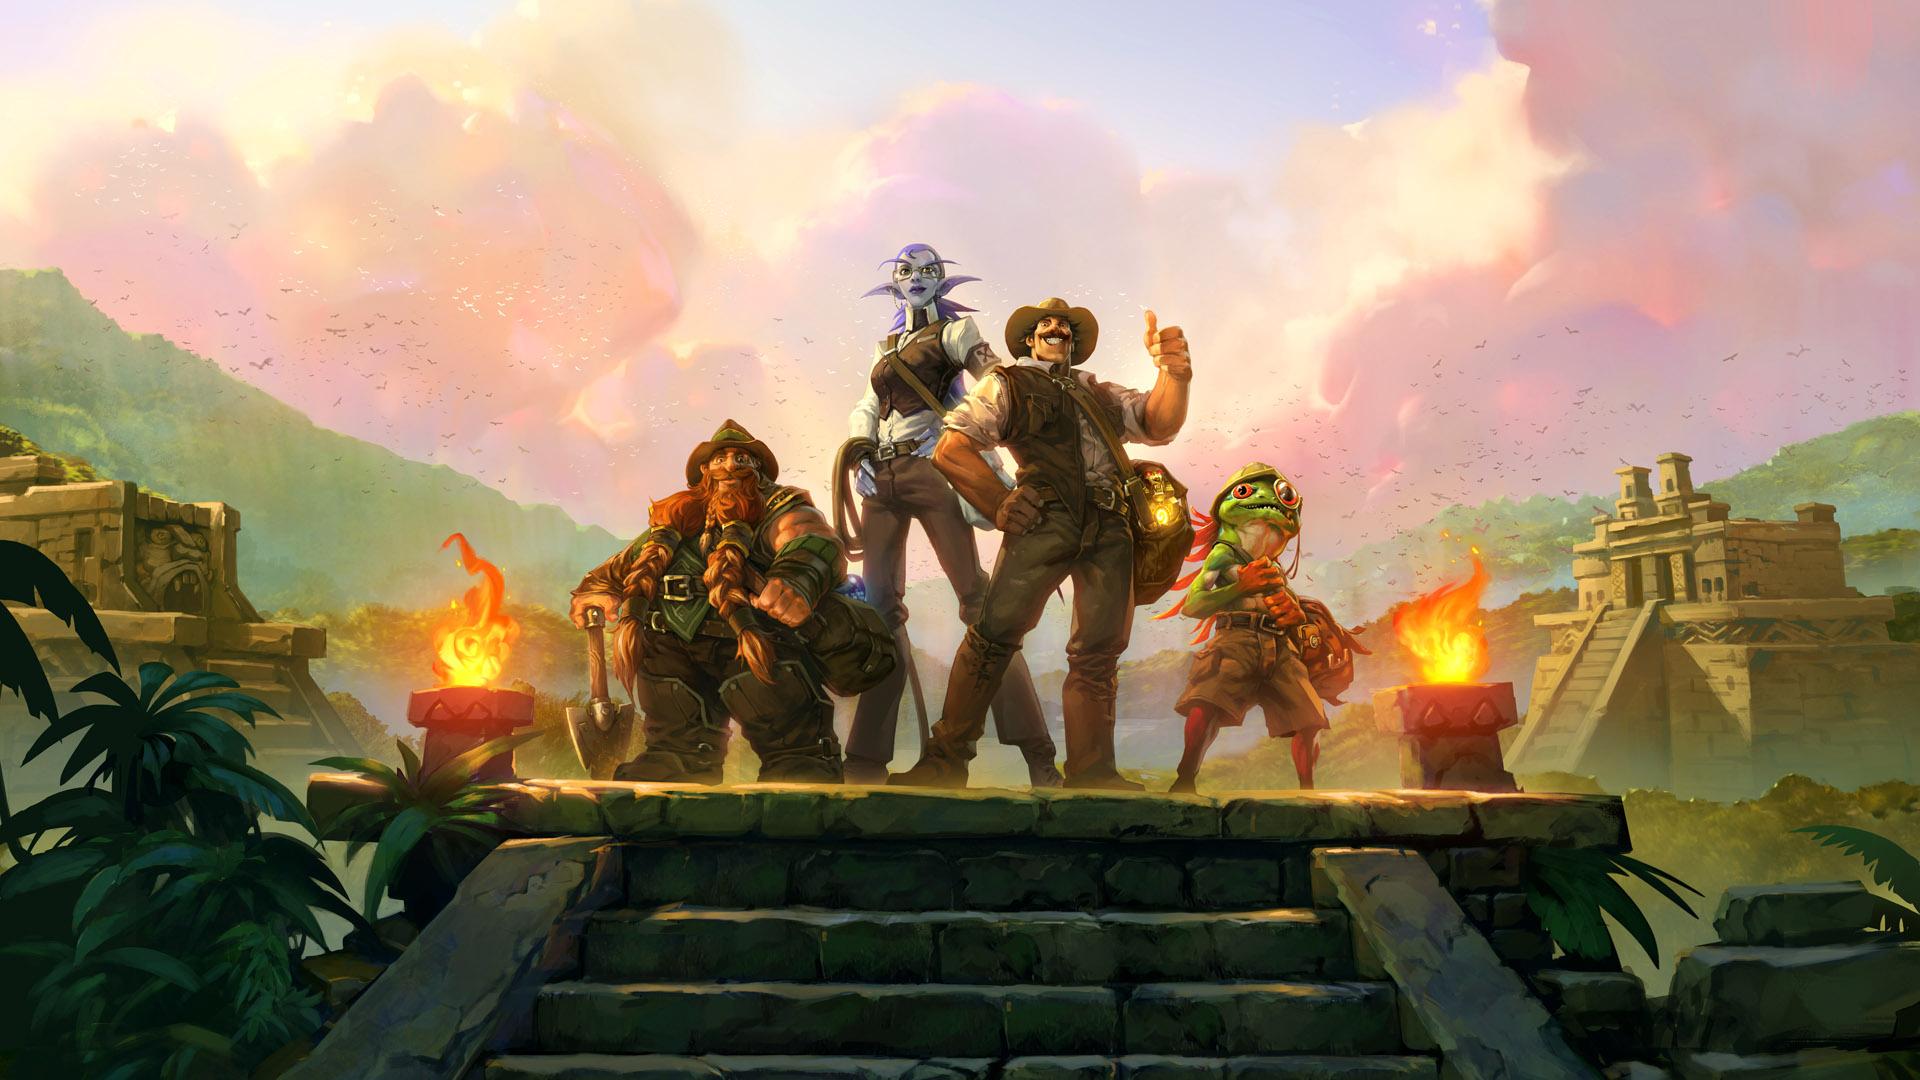 Karazhan A Primer For Hearthstones Fingers Crossed Next Adventure GamesBeat